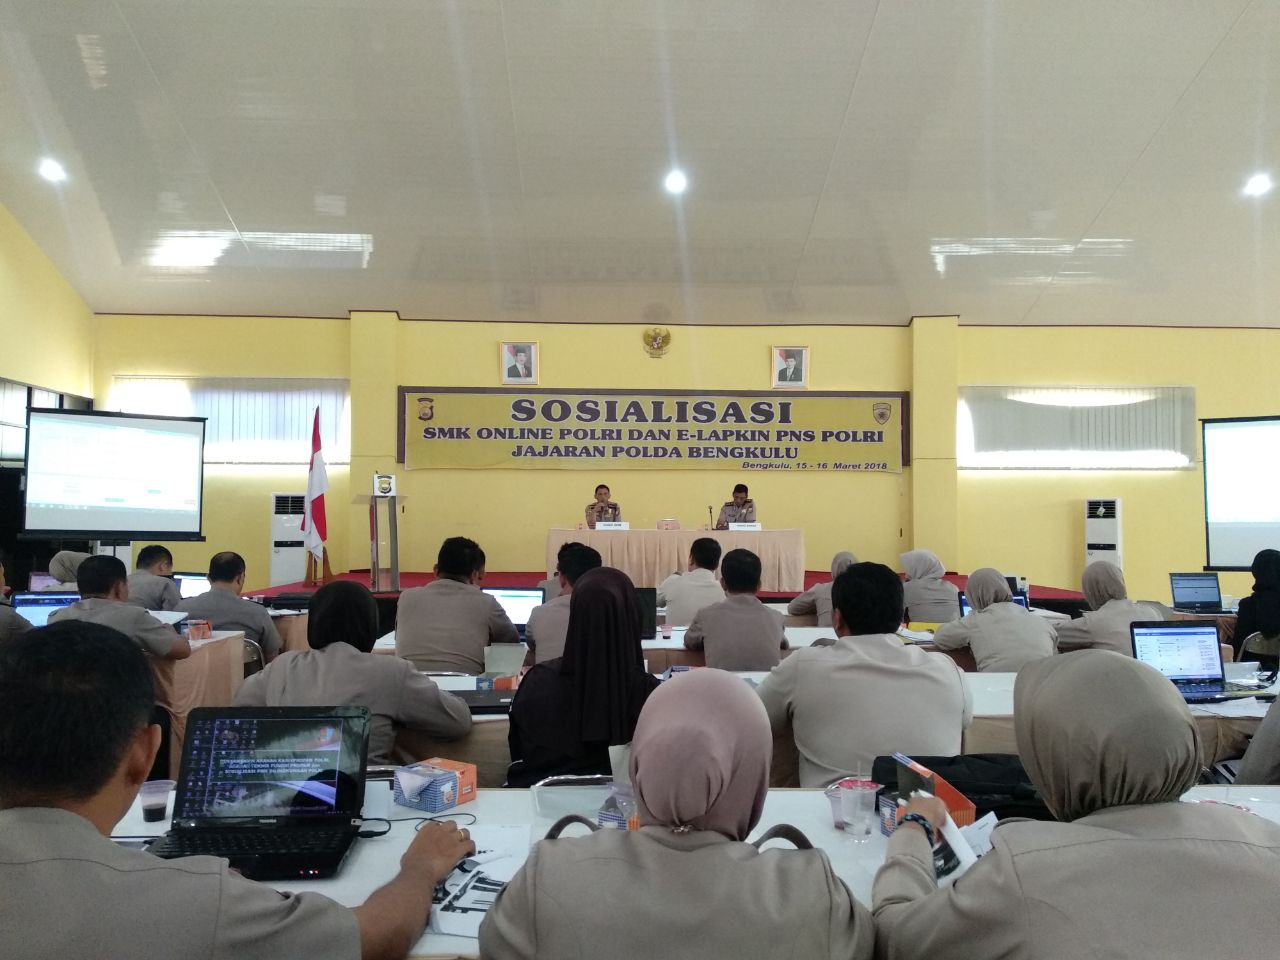 Ini Arahan Karo SDM Polda Bengkulu, Saat Sosialisasi SMK-Online Polri dan E-Lapkin PNS Polri